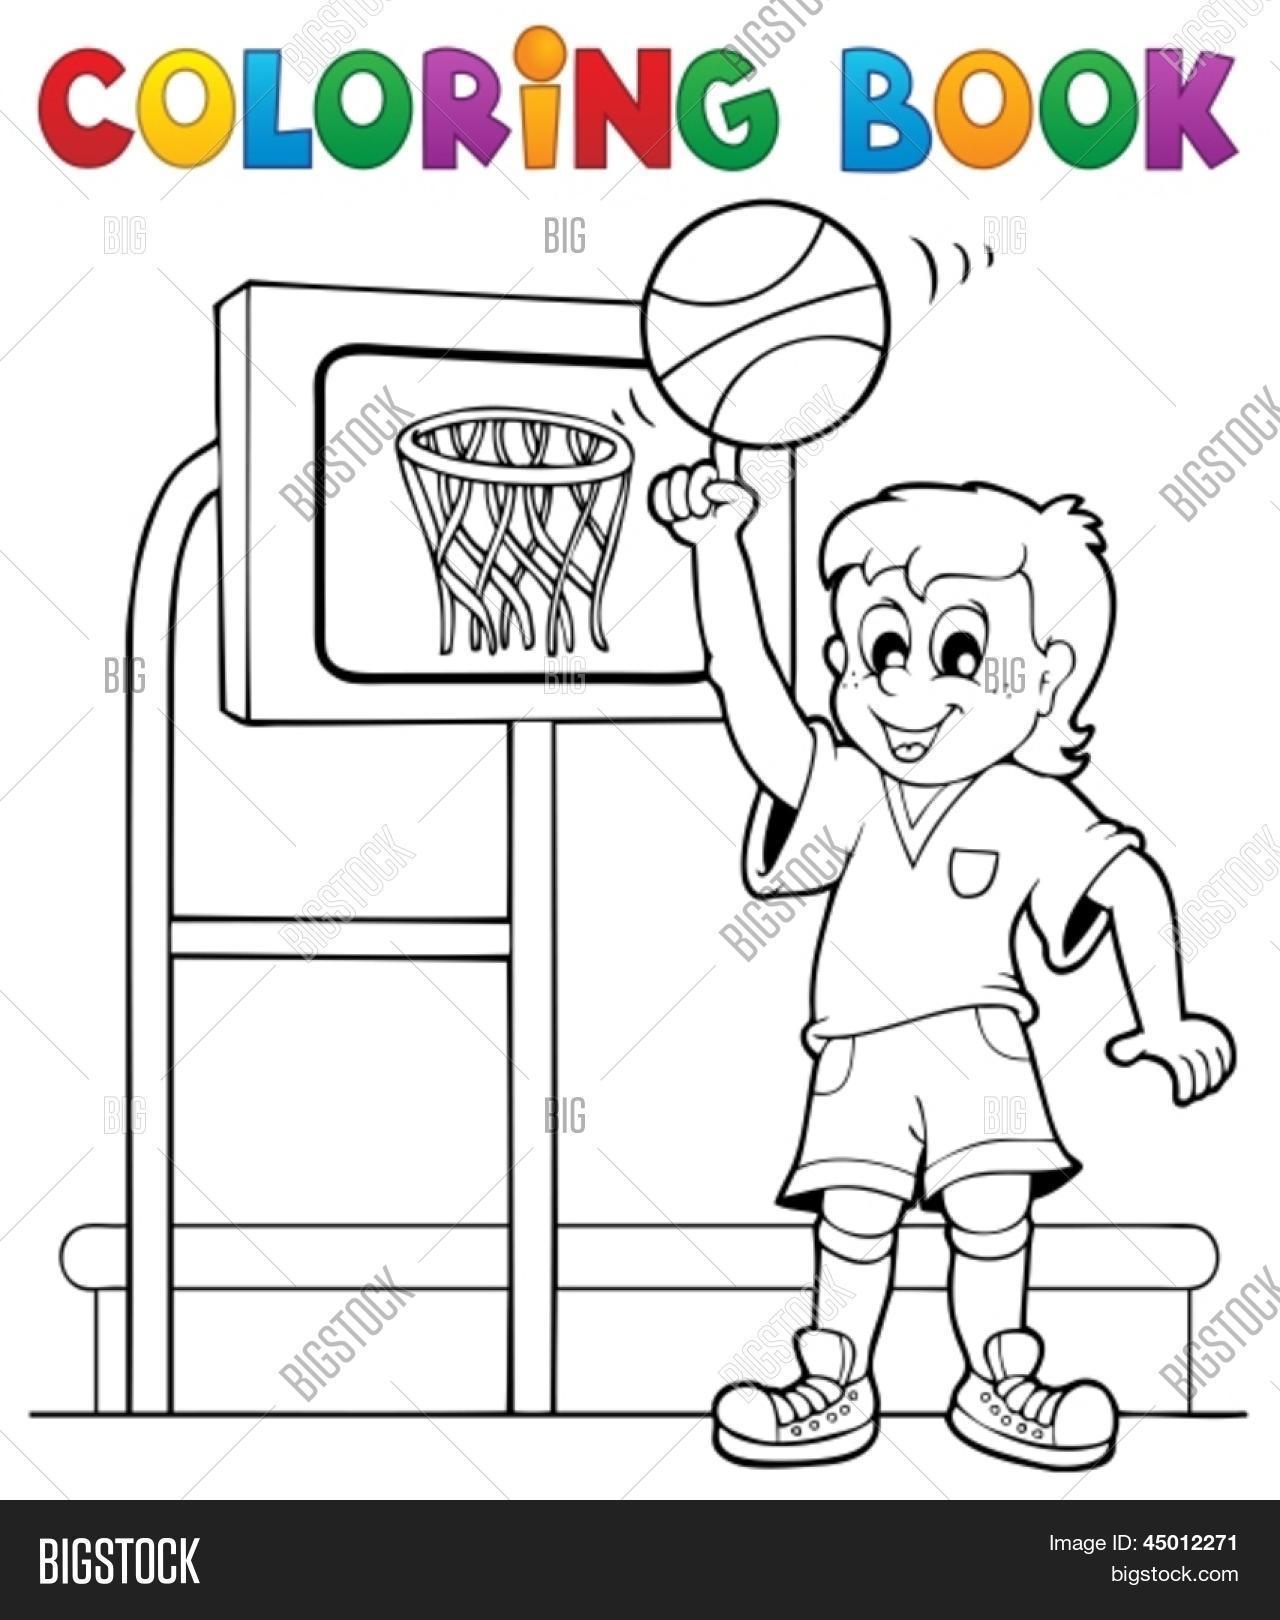 Coloring Book Sport Gym Theme 3 - Vector & Photo | Bigstock